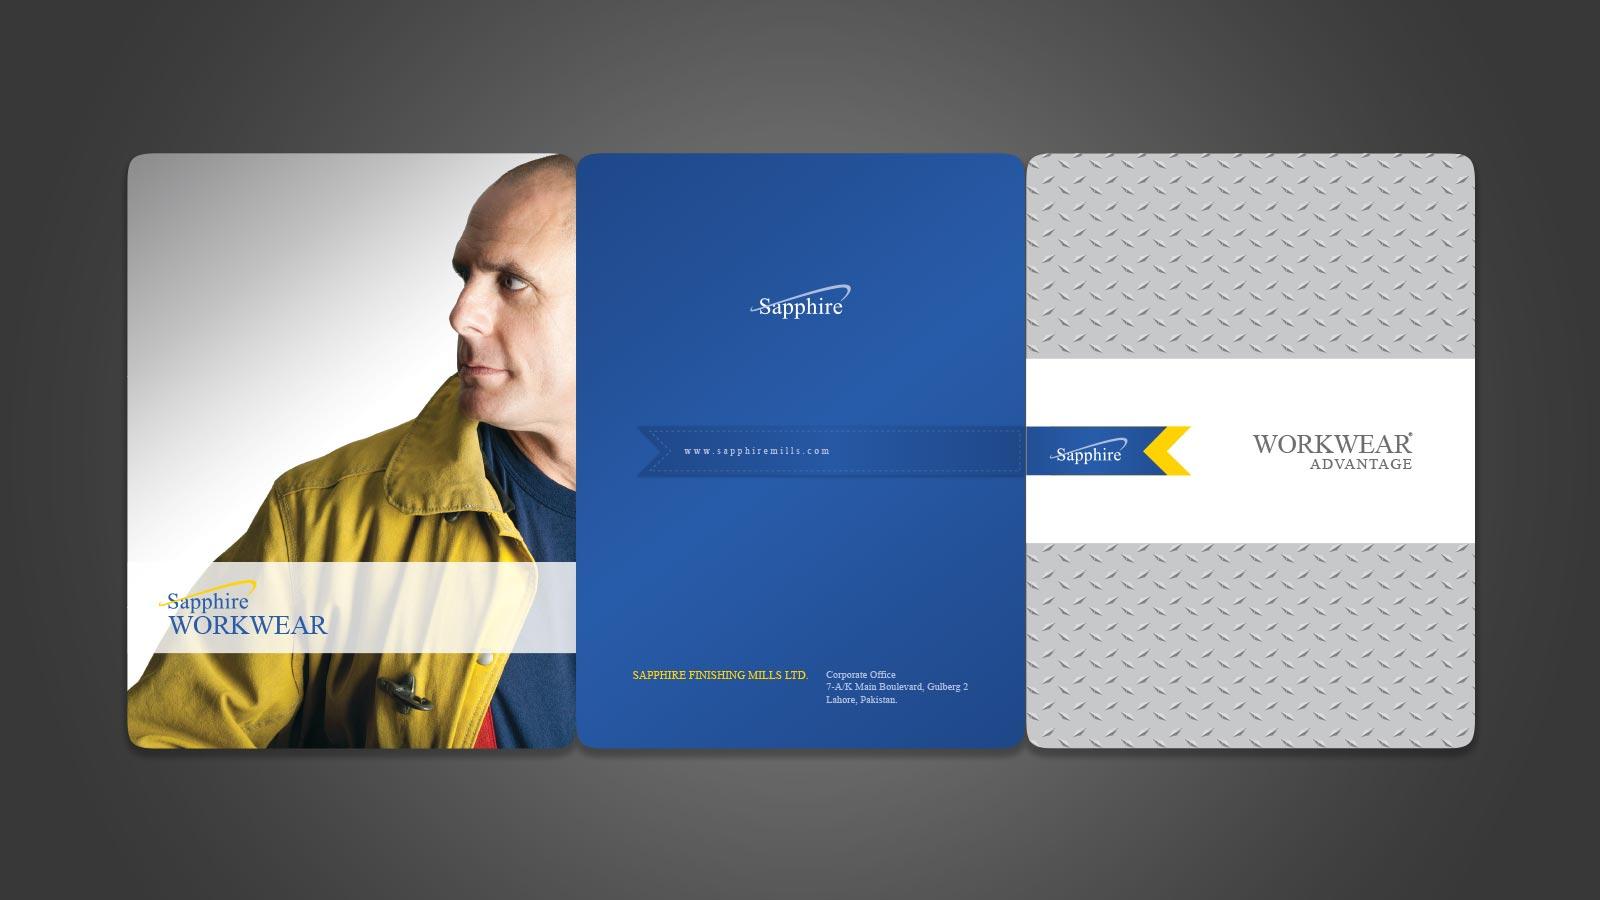 sapphire-textiles-graphic-brand-design-web-designer-hiline-lahore-pakistan-012